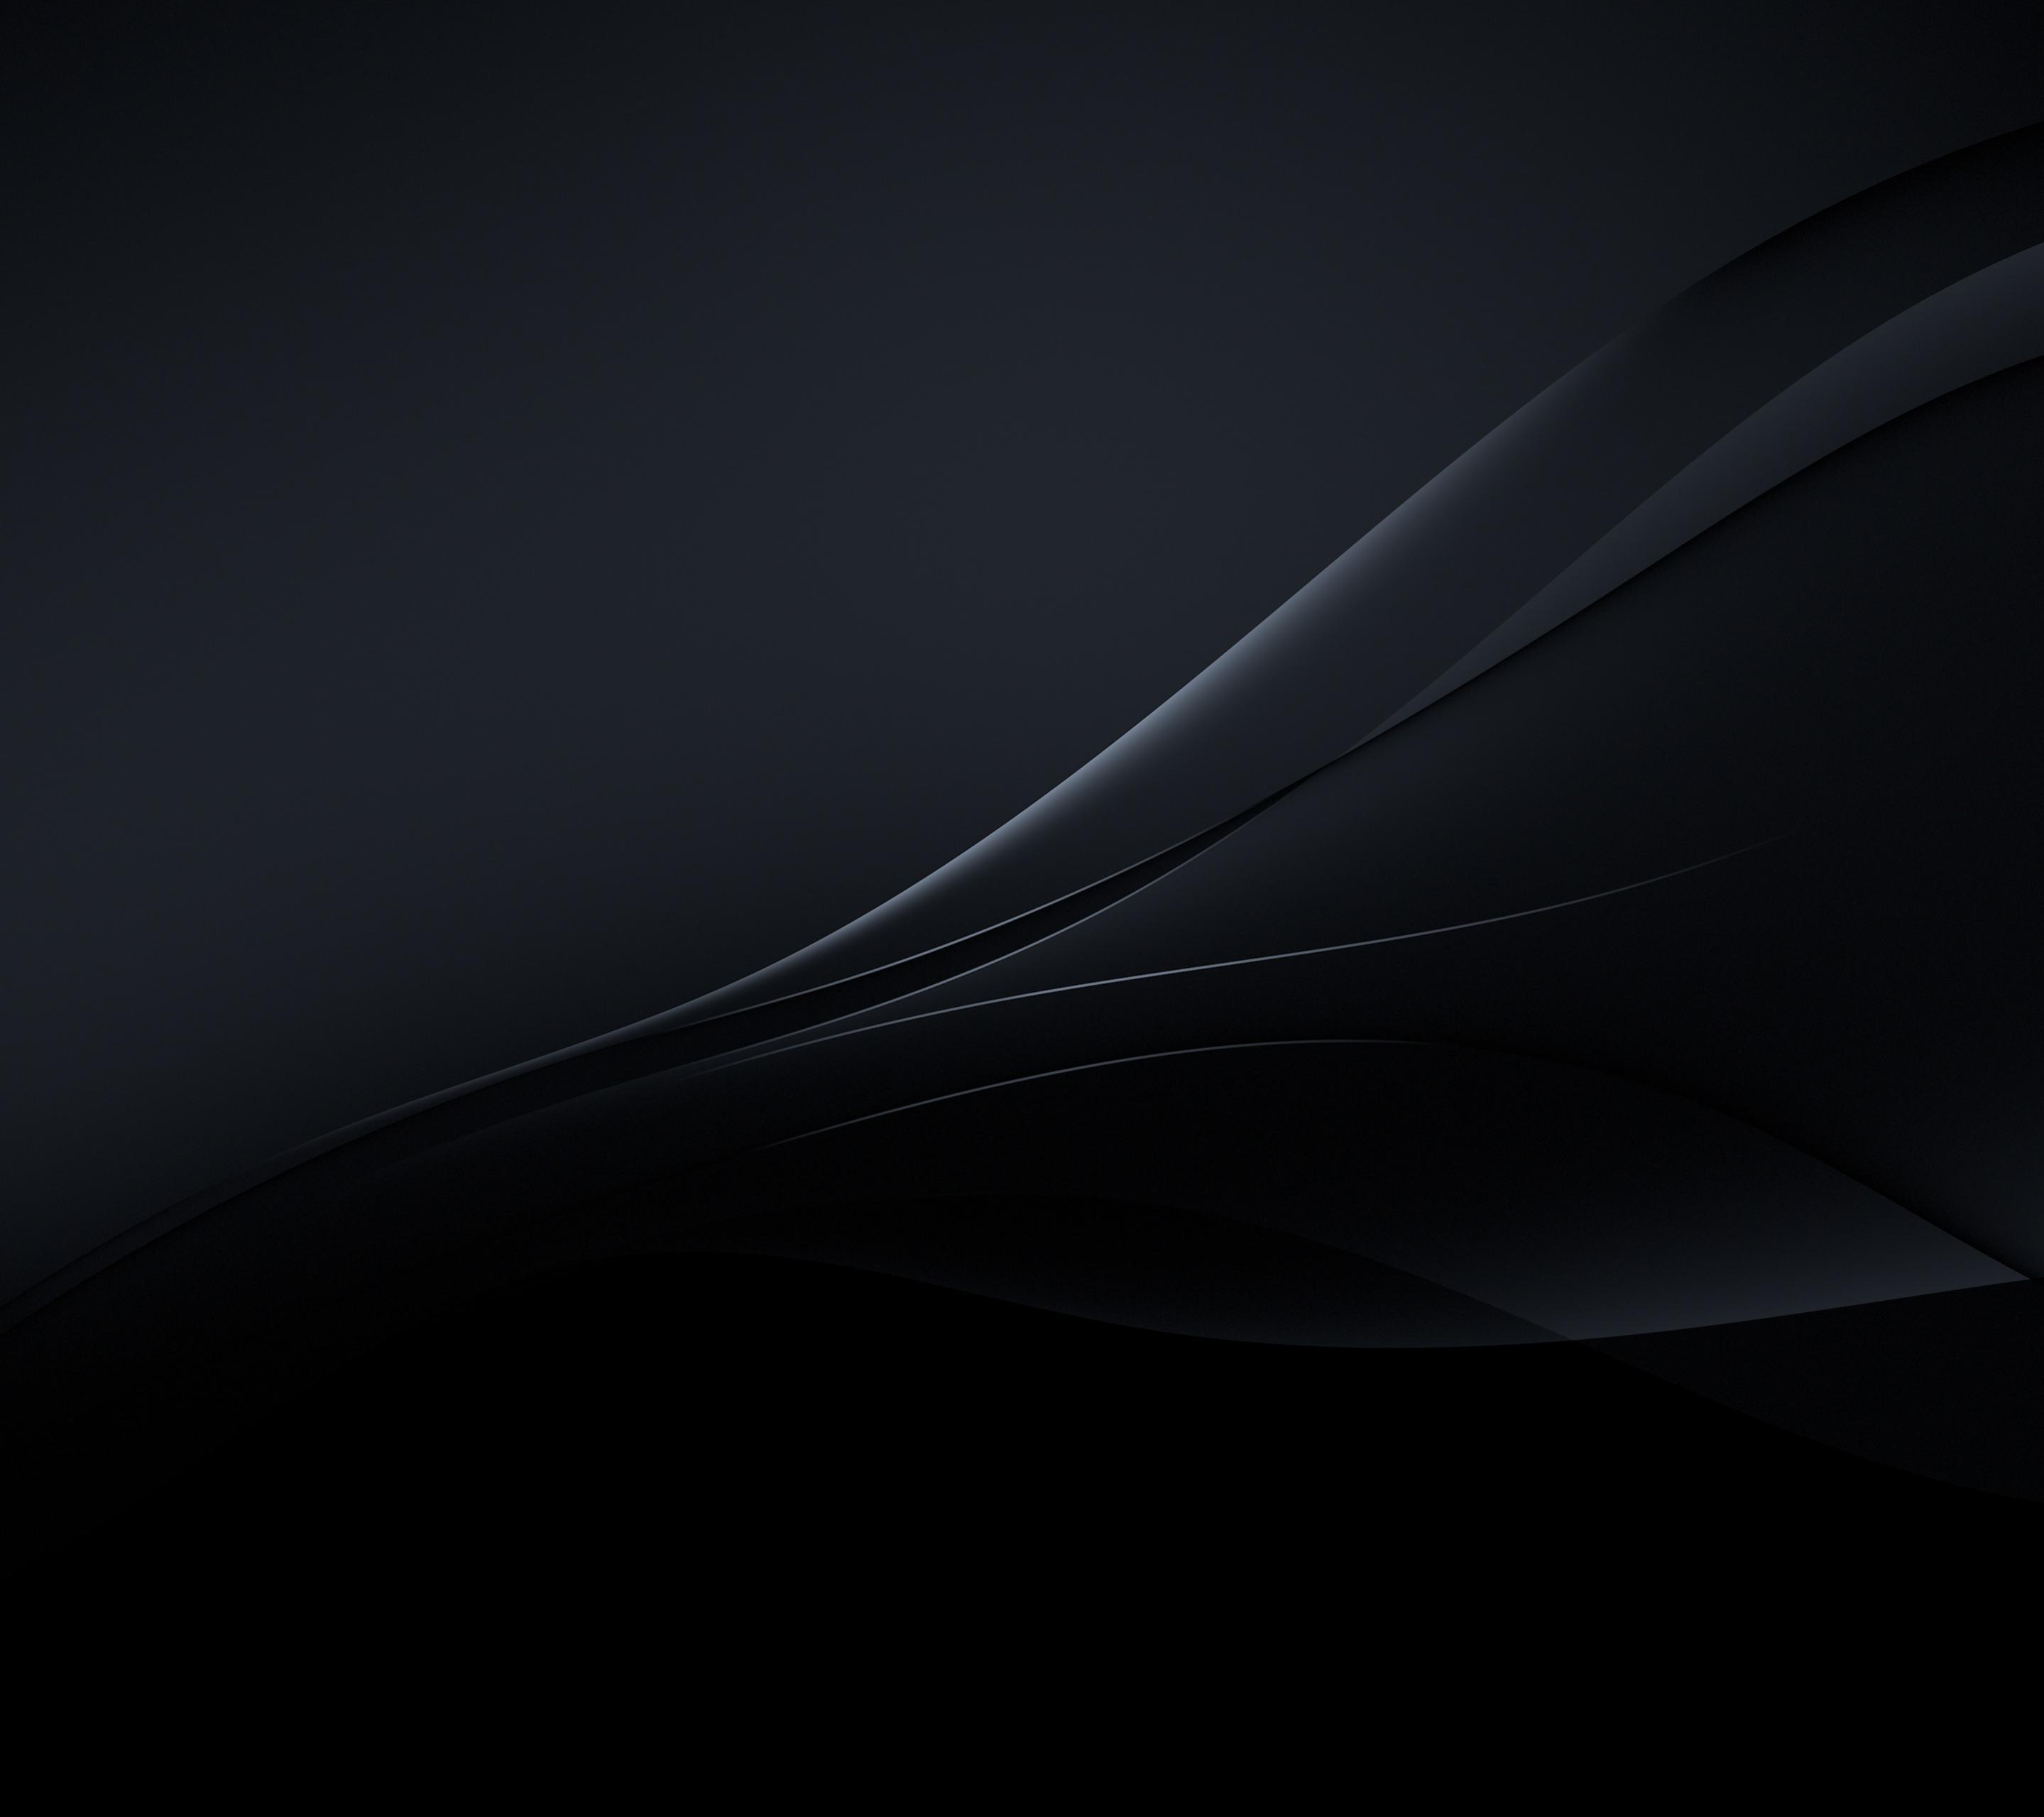 Motorola Logo Full Hd Wallpaper Download Official Xperia Z4 Wallpapers In Black White